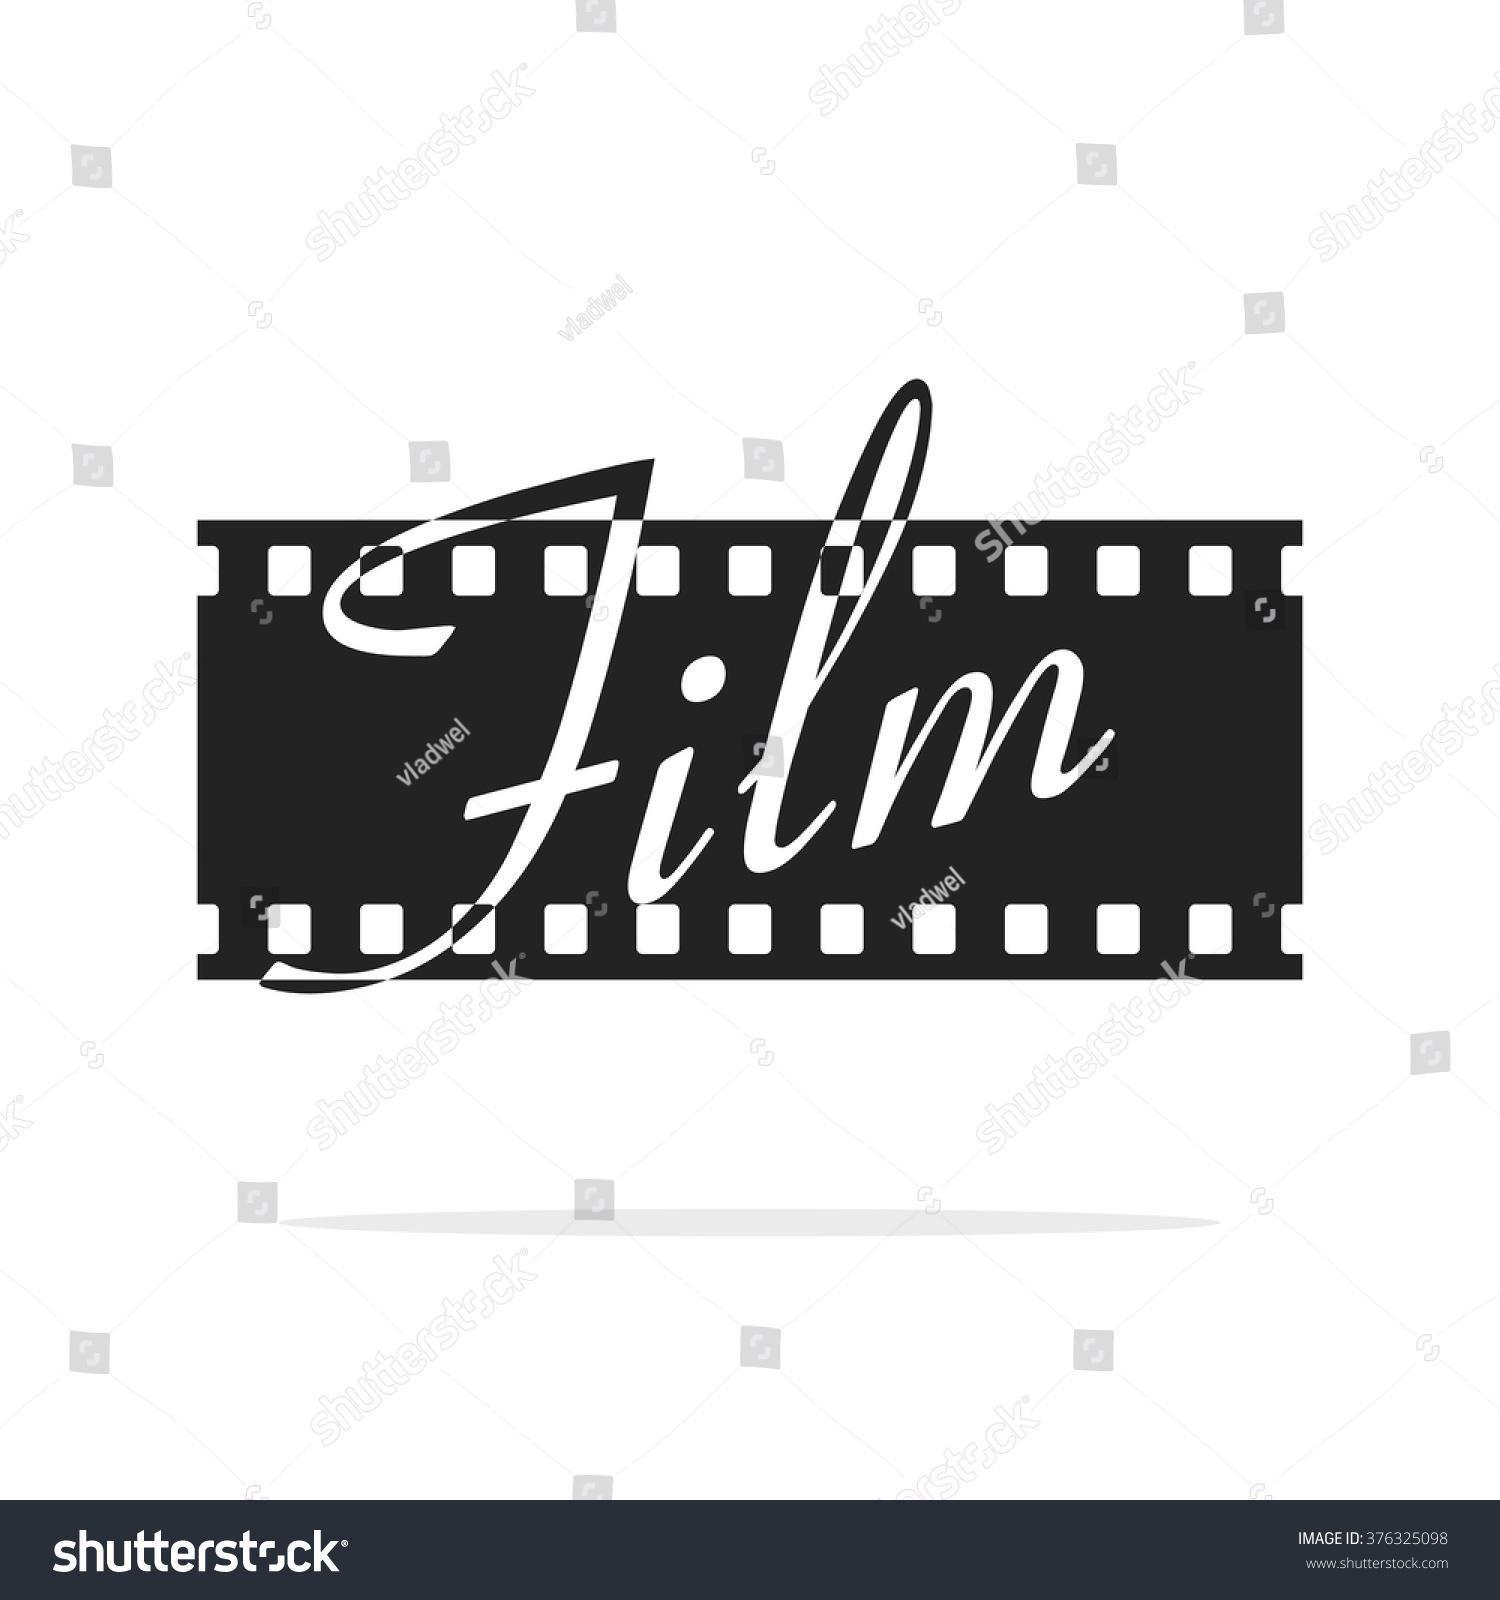 Camera film strip vector logo with film text filmstrip for Camera film logo